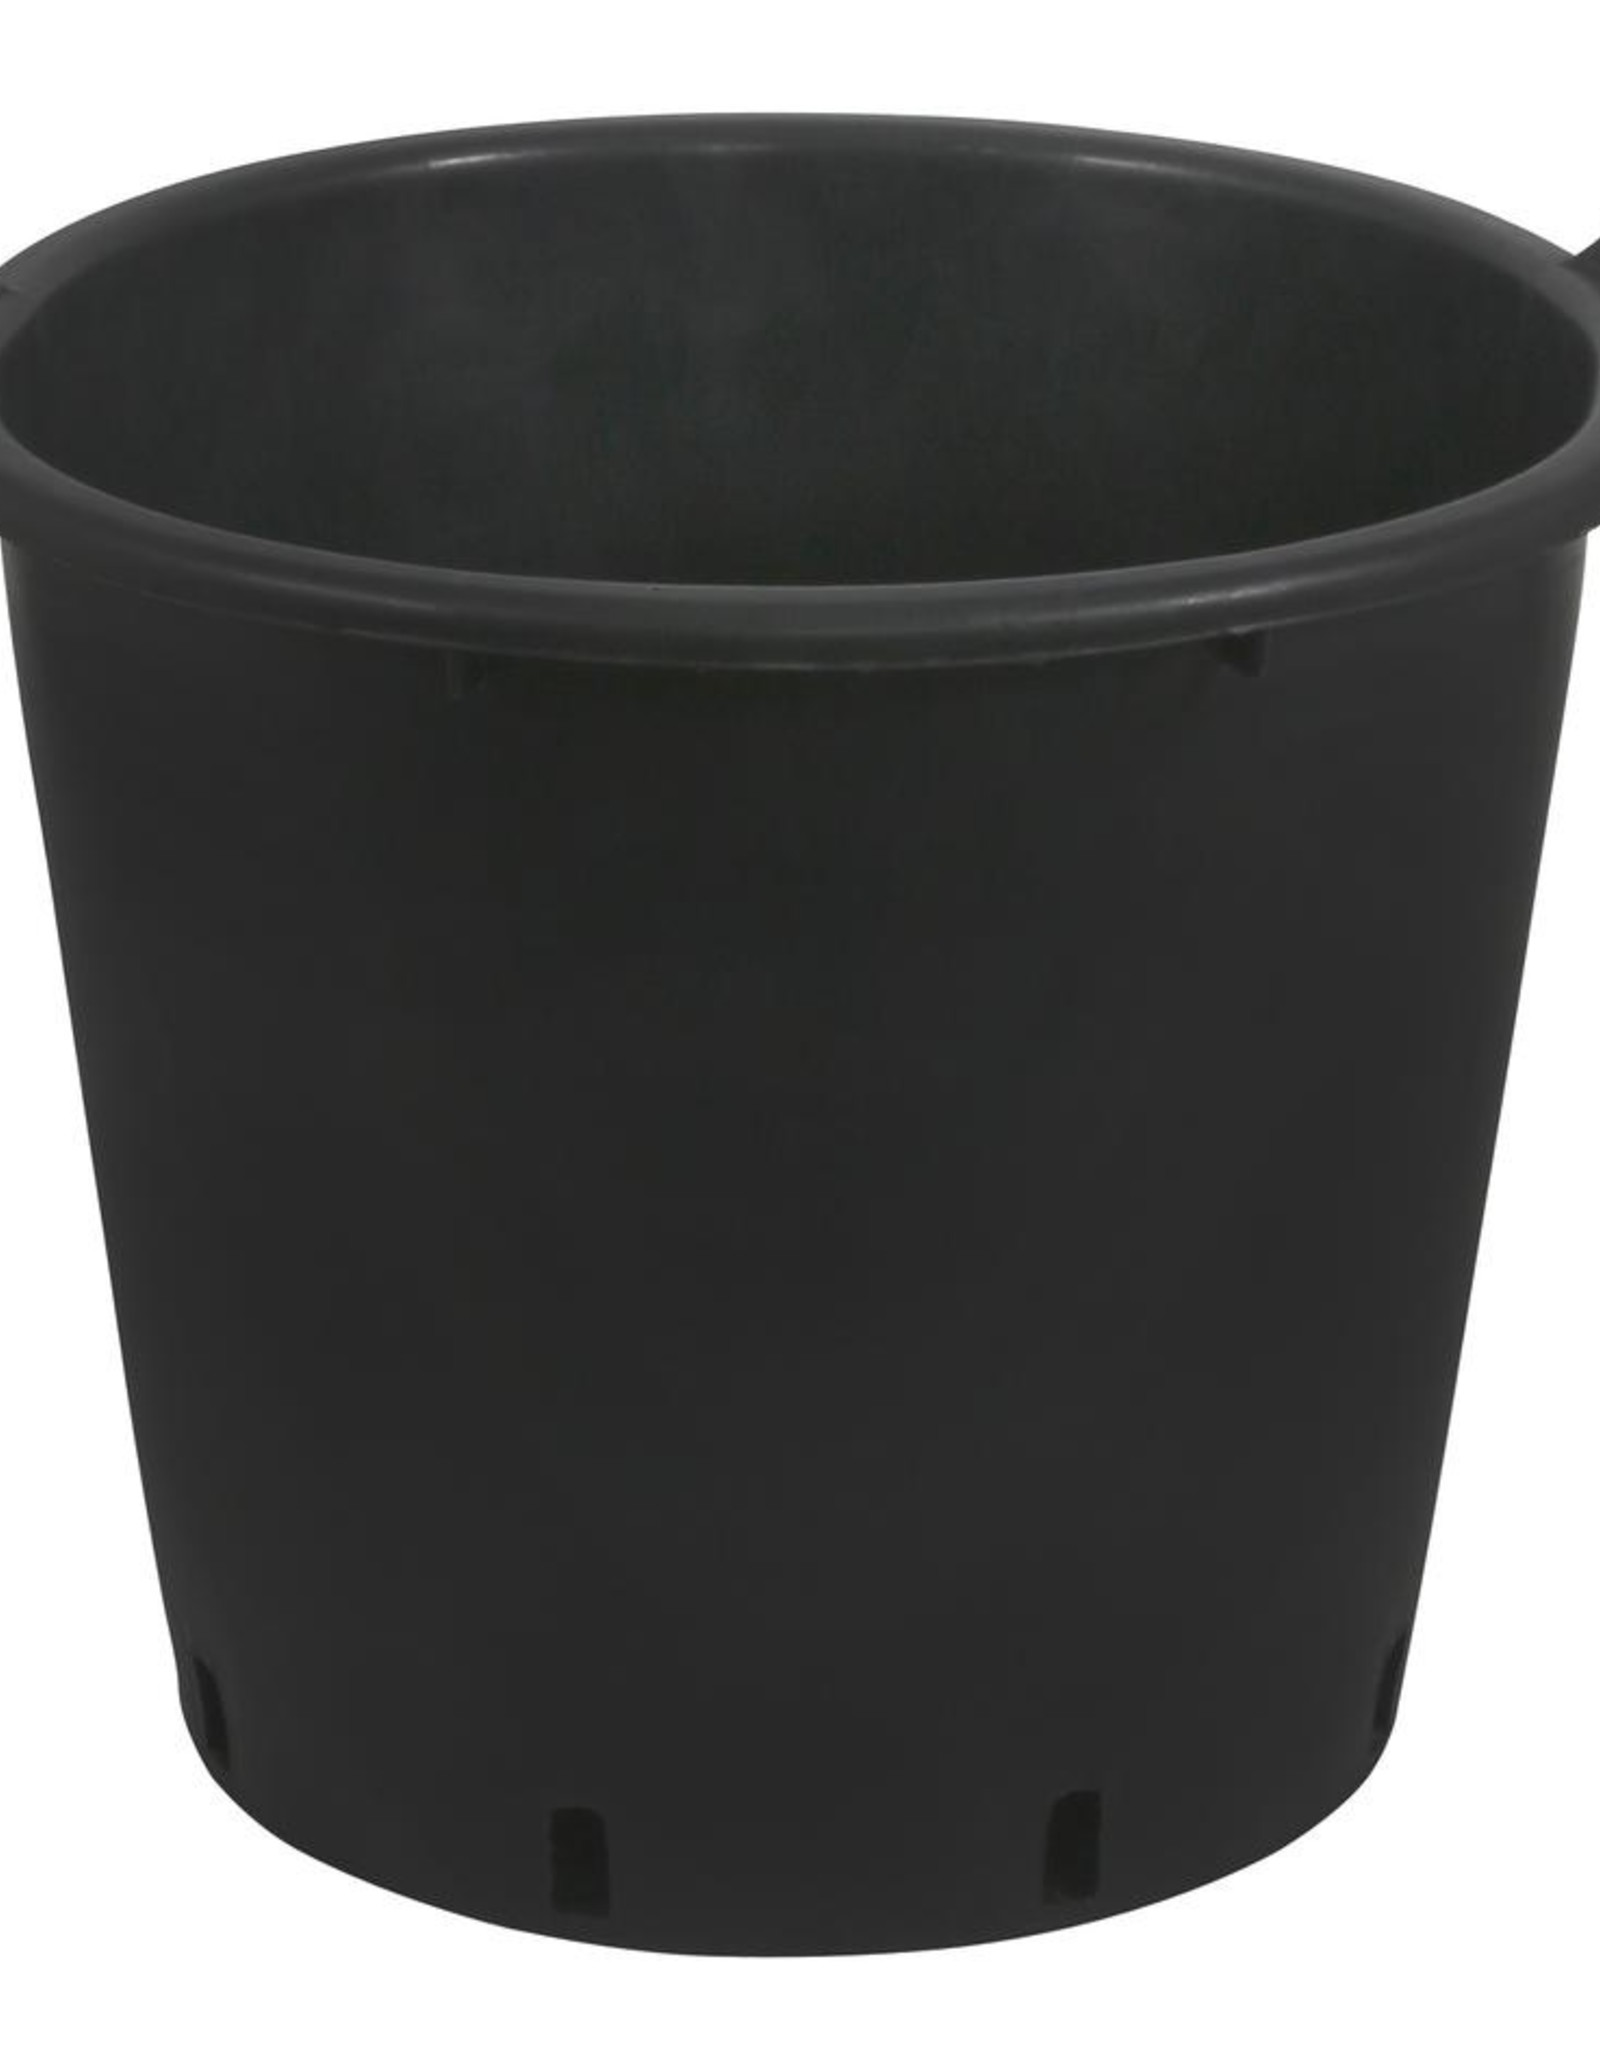 GRO PRO Gro Pro Heavy Duty Container w/ Handles 9 Gallon